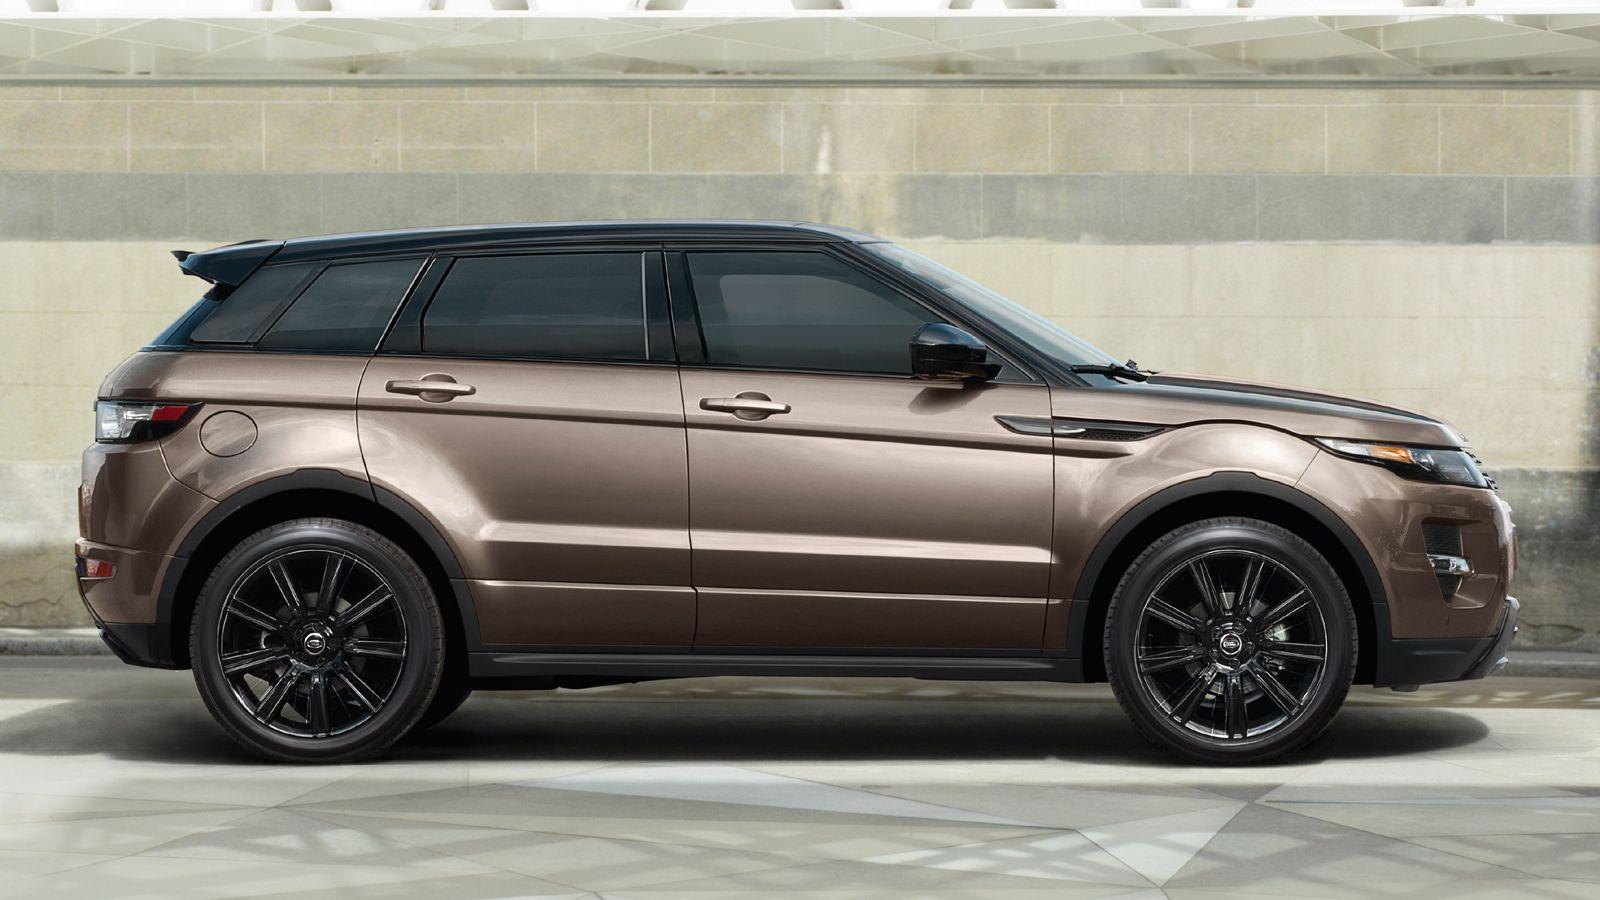 2015 Range Rover Evoque... This will be my next vehicle